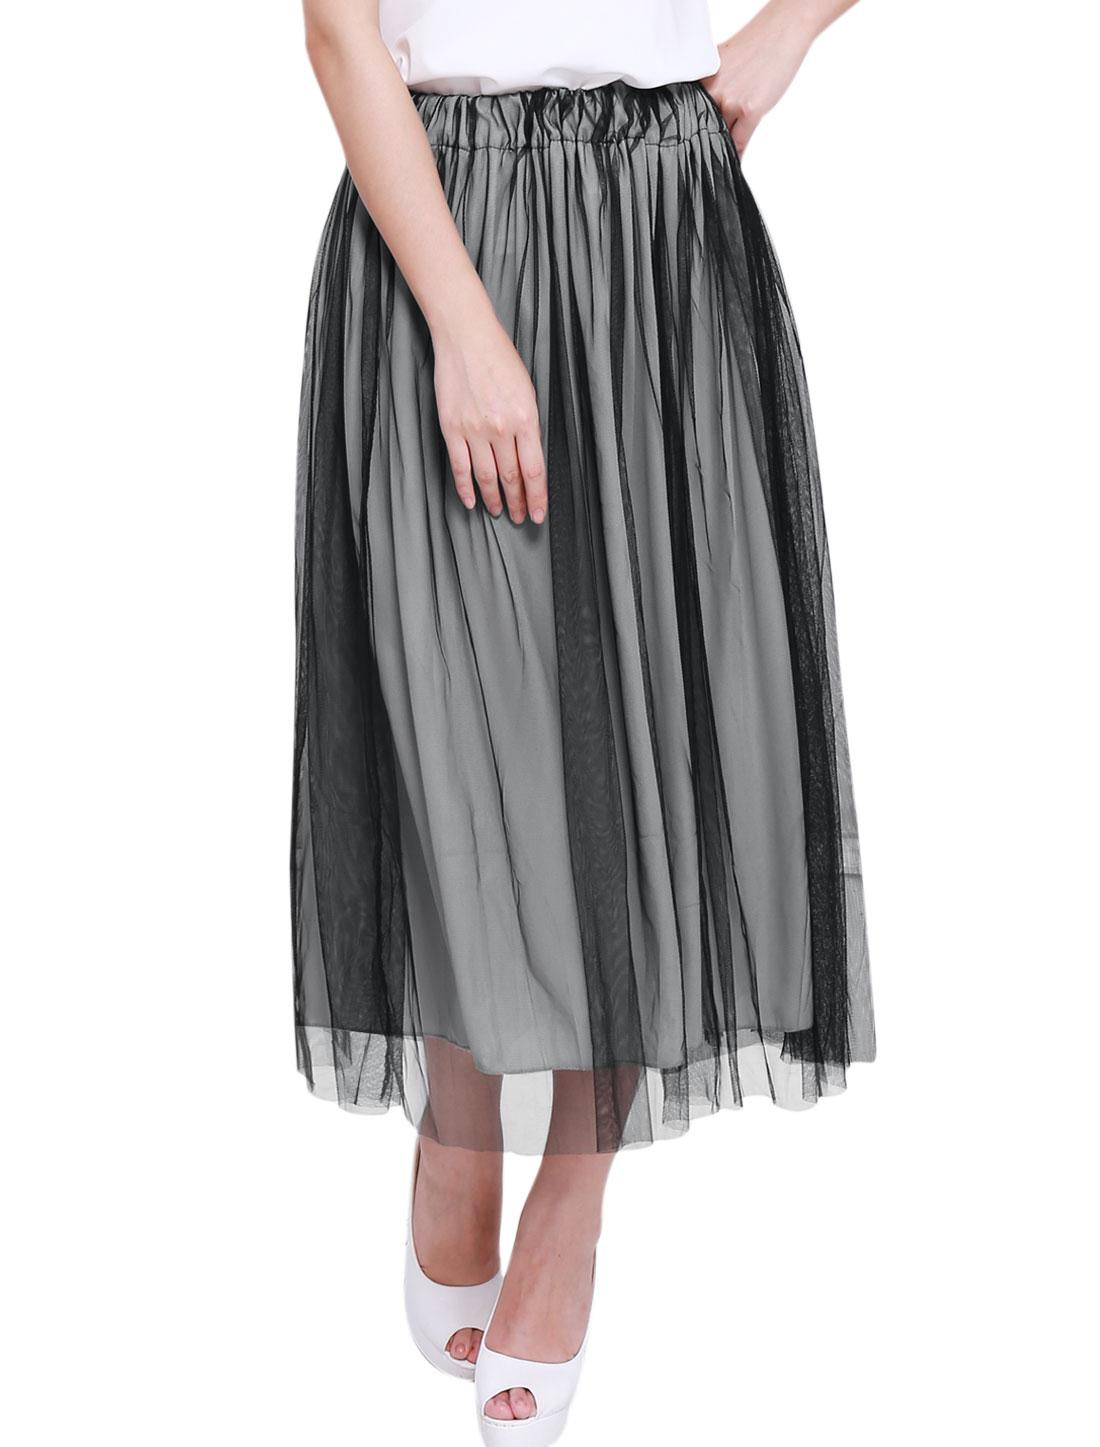 Ladies Stretchy Waist Lining Ruffled Design Elegant Mesh Skirt Black Light Gray L